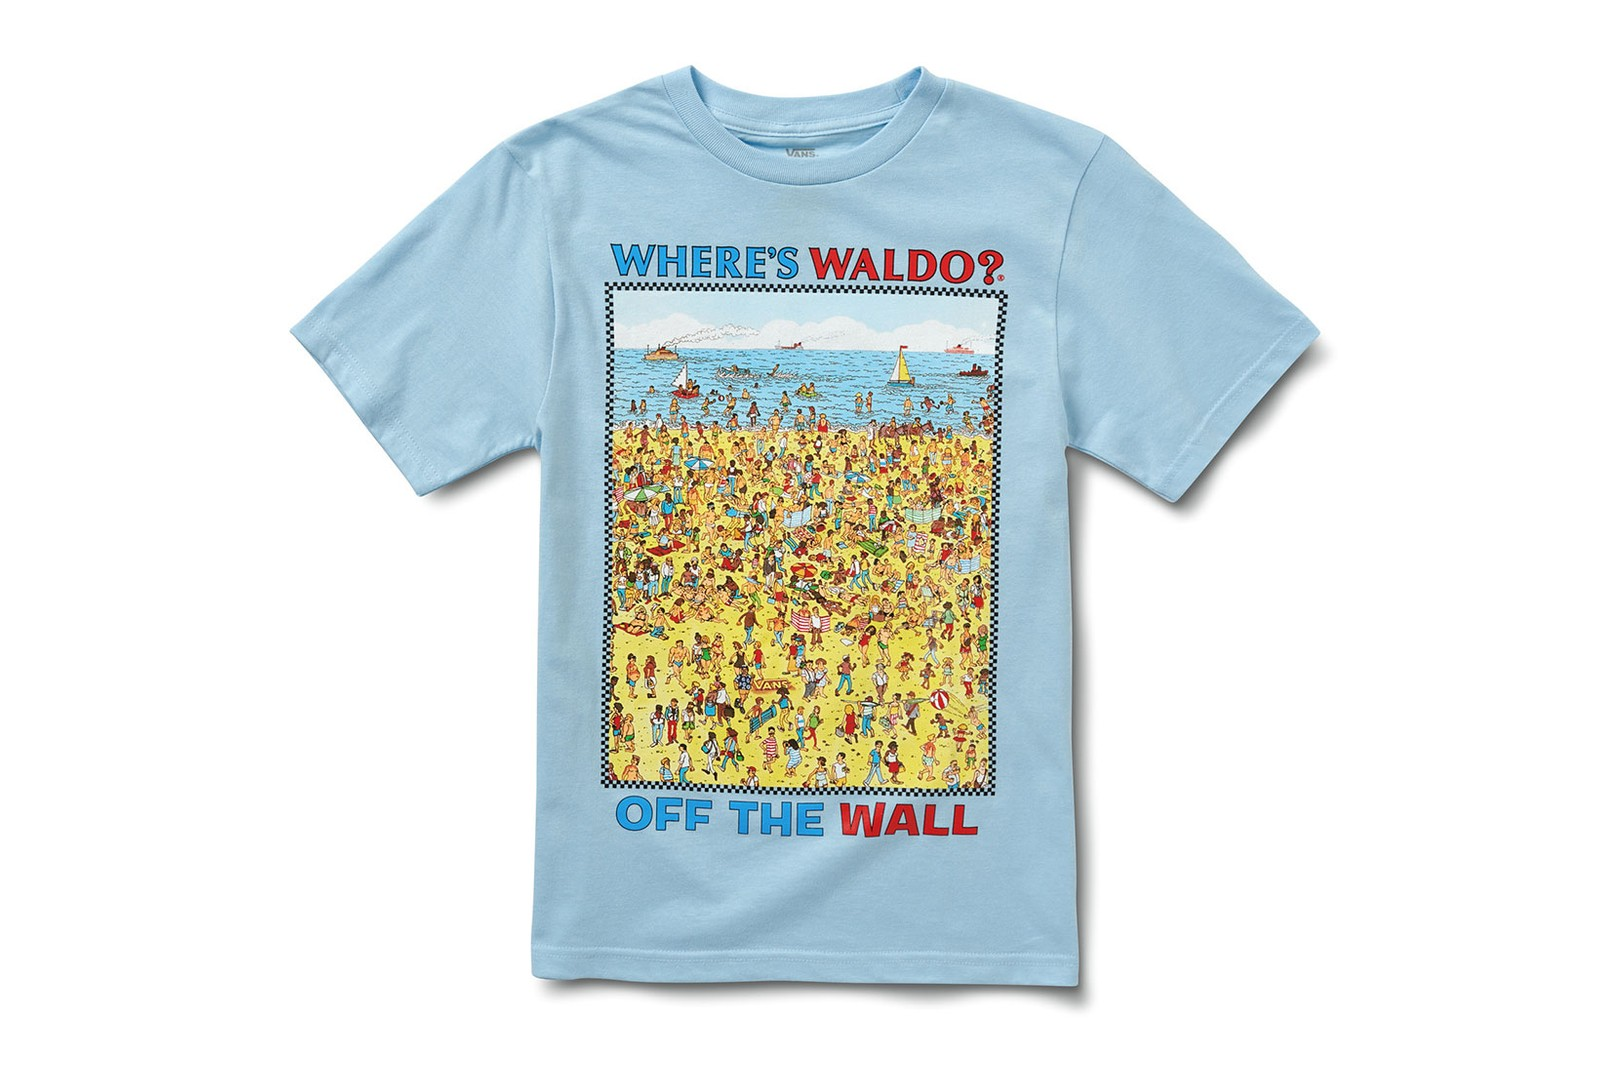 vans wheres waldo wally collaboration kids slip-on era old skool sk8-hi t-shirts hoodies